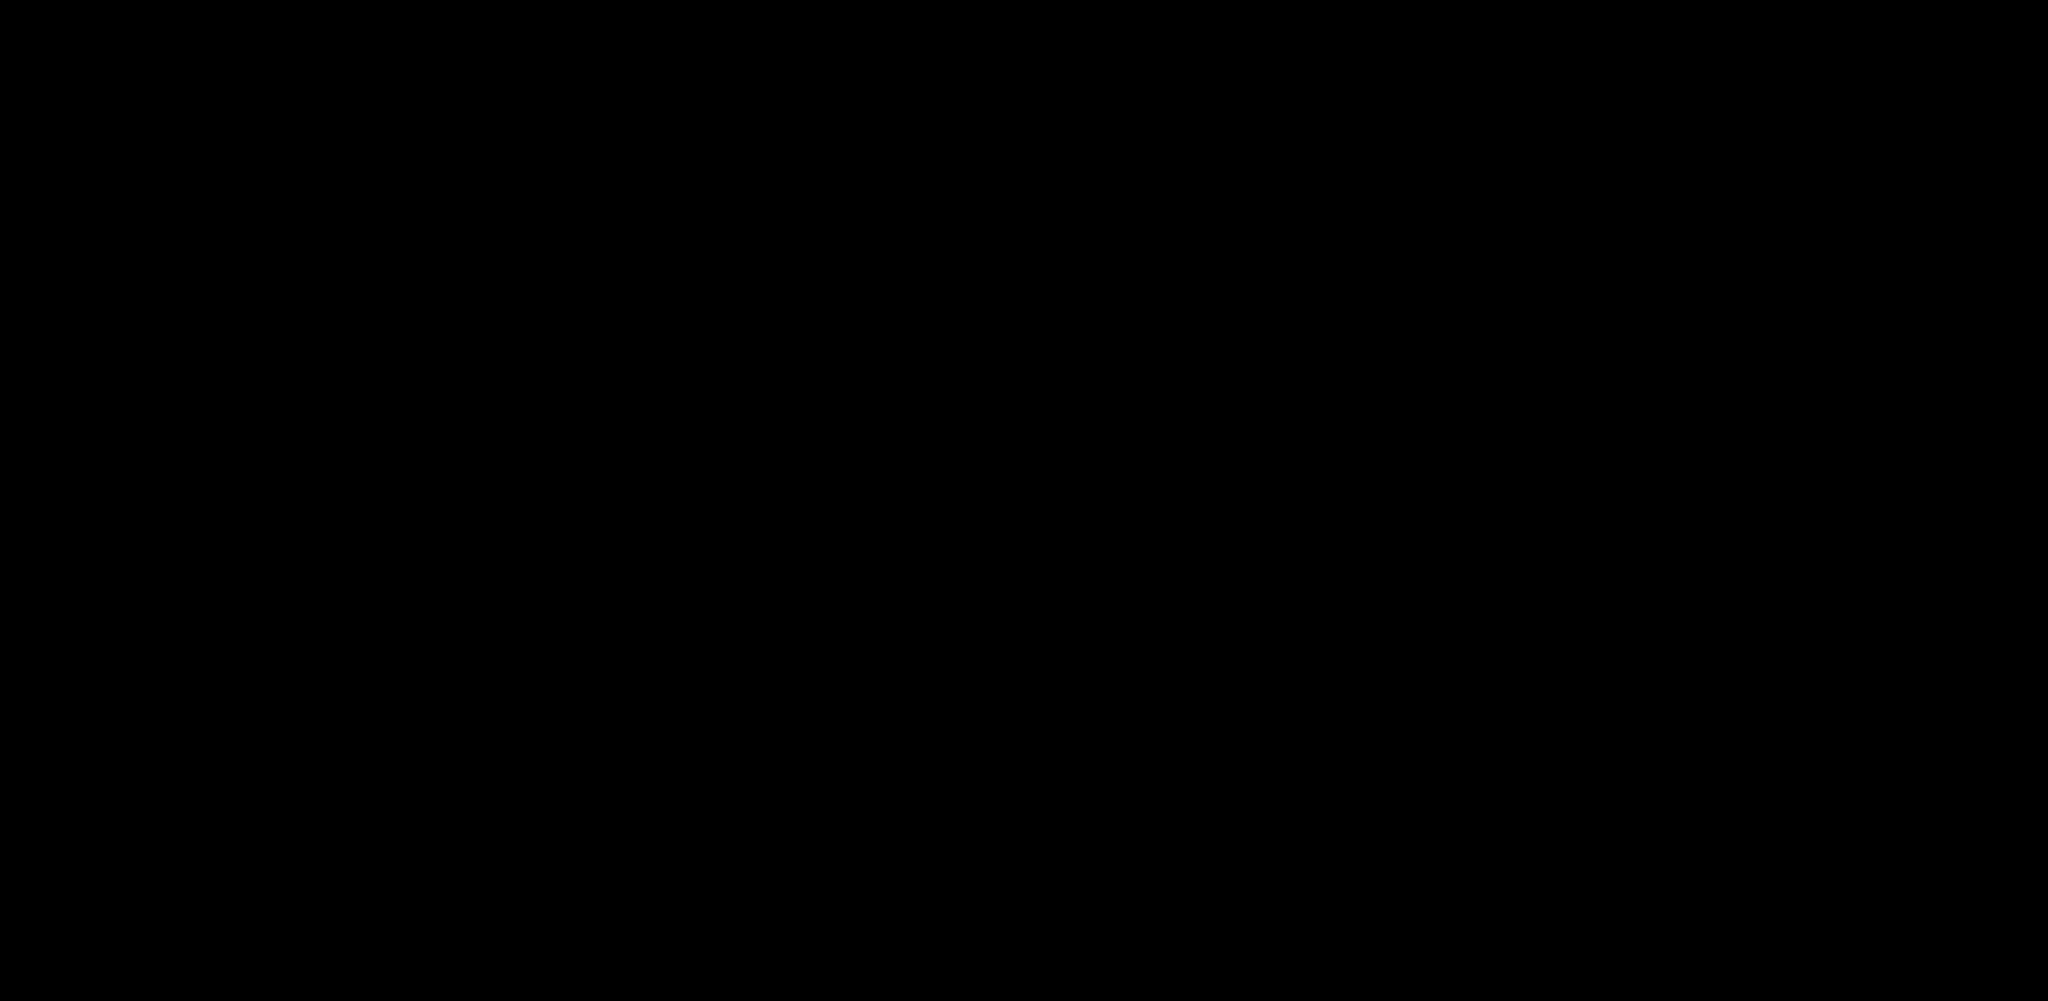 05160044-pano-bearbeitet-cs